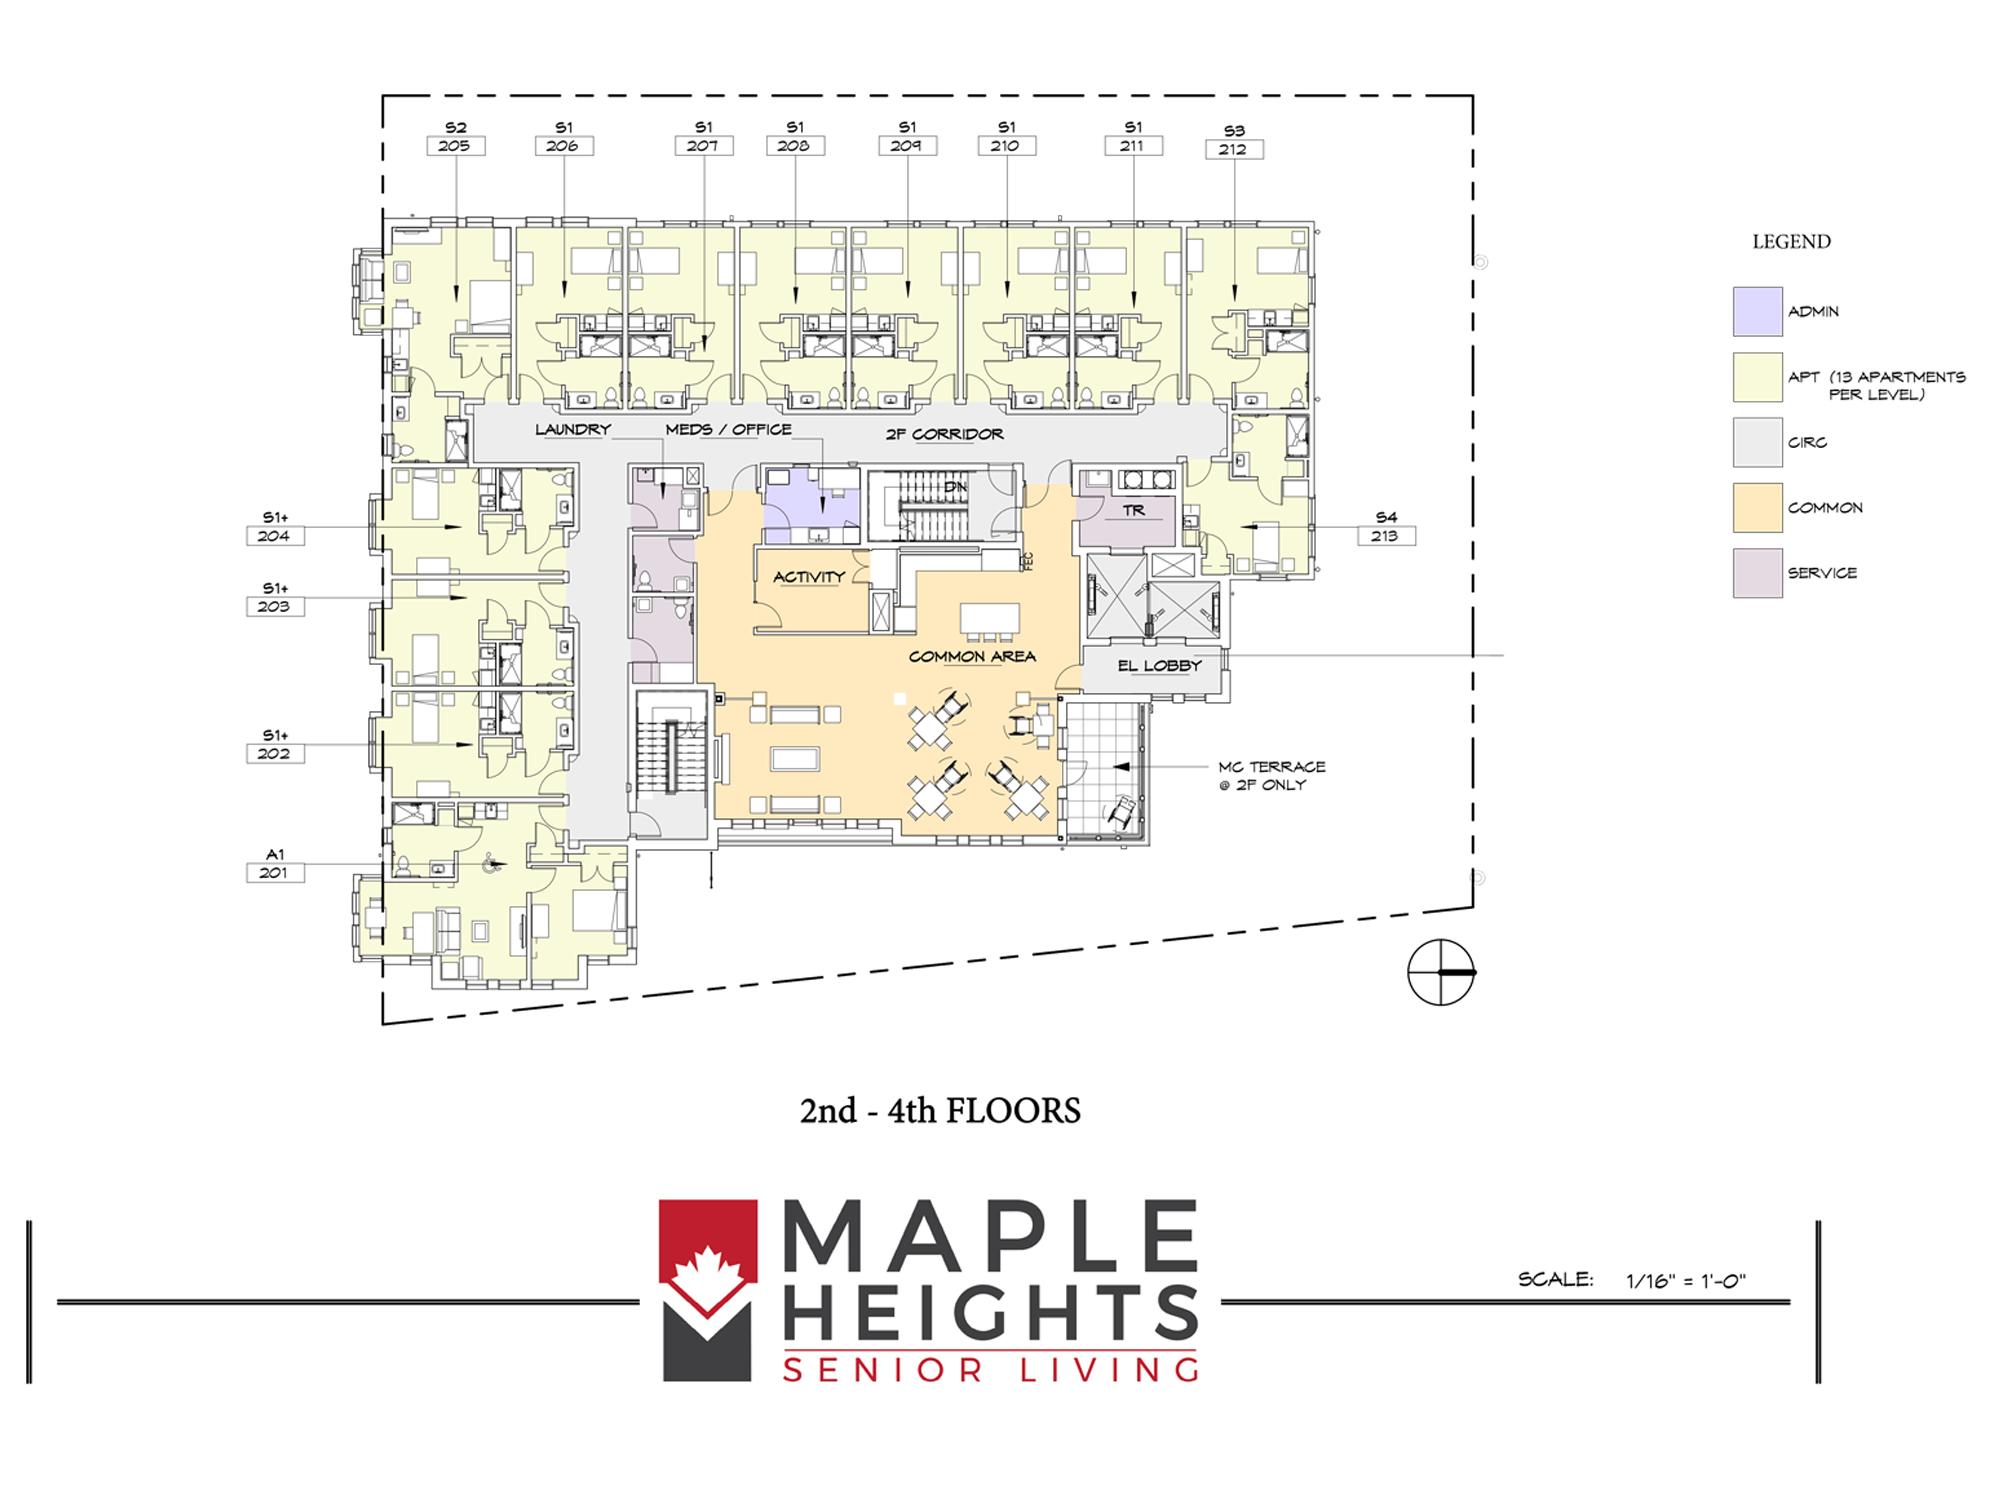 Washington DC Senior Living Floor Plan 2nd-4th Floors